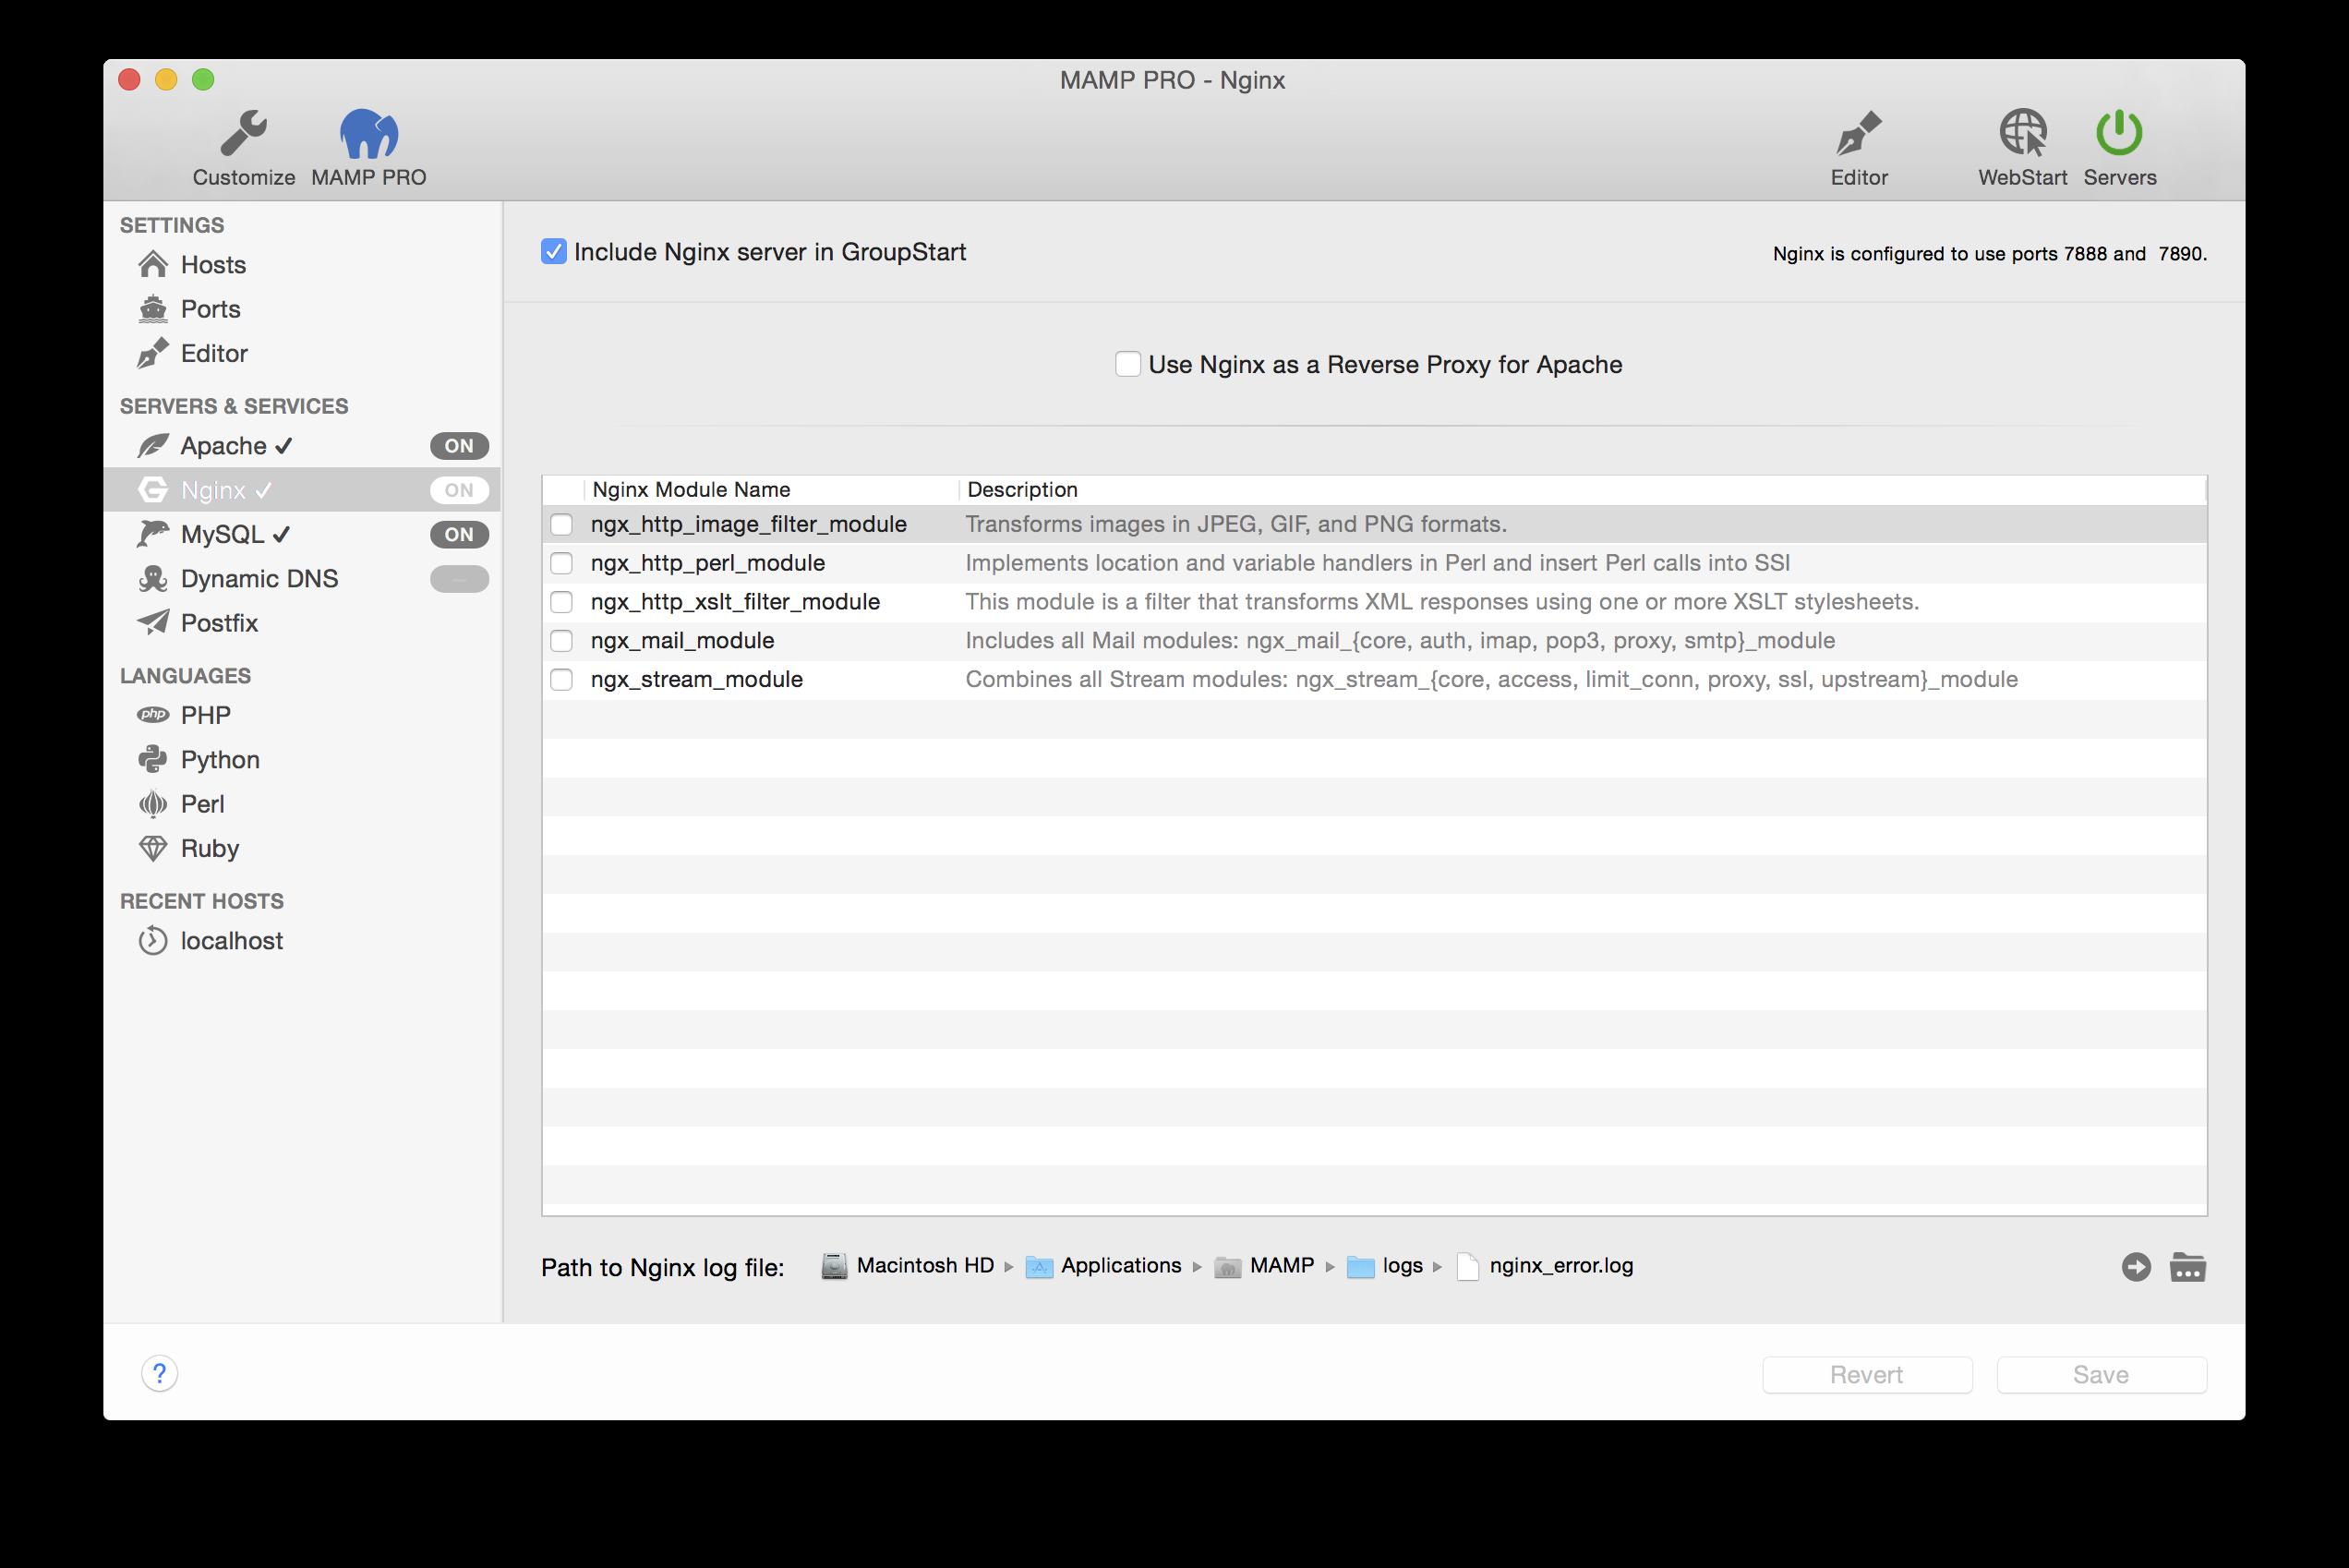 MAMP PRO (Mac) Documentation > Servers and Services > Nginx